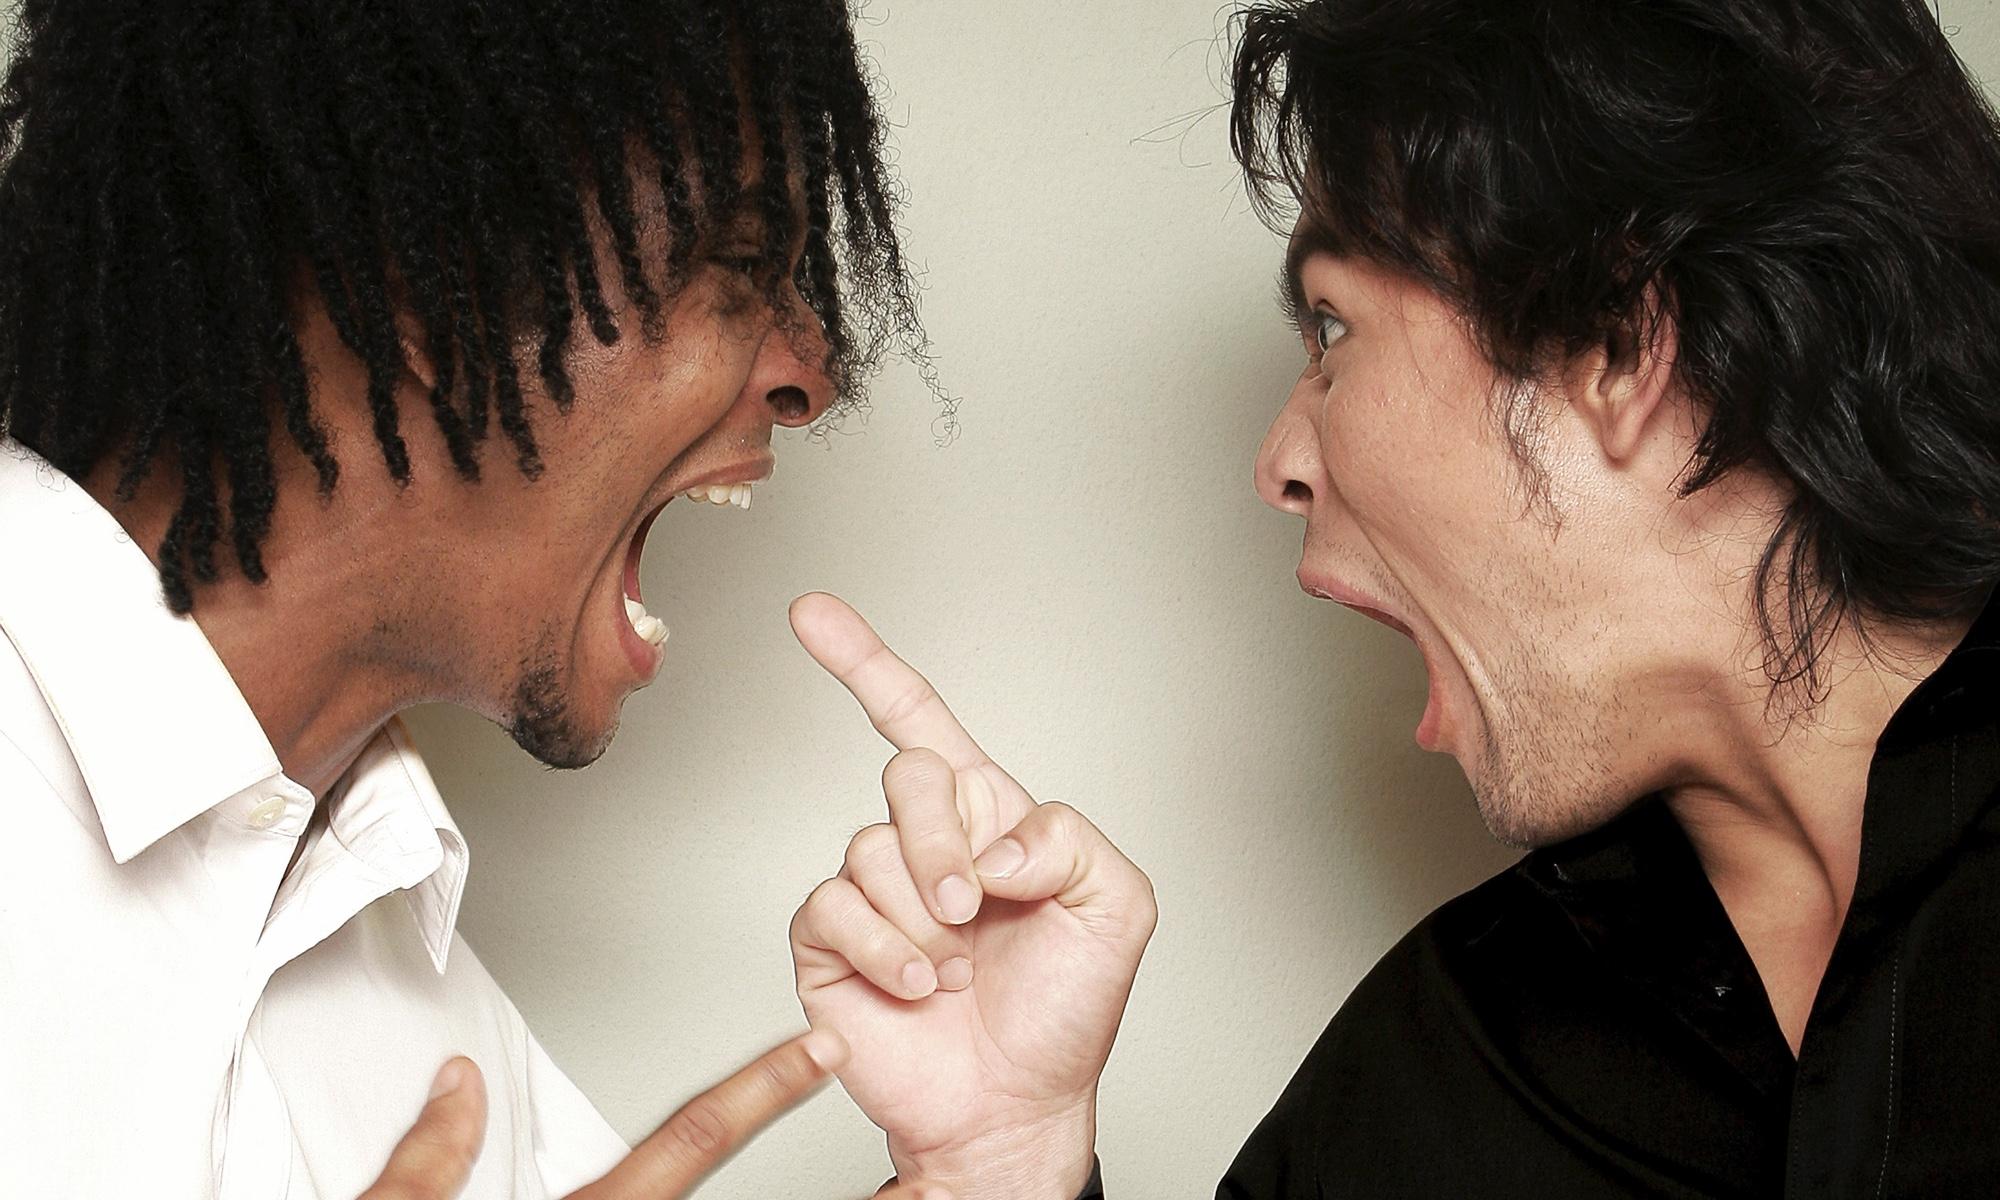 Two men arguing.